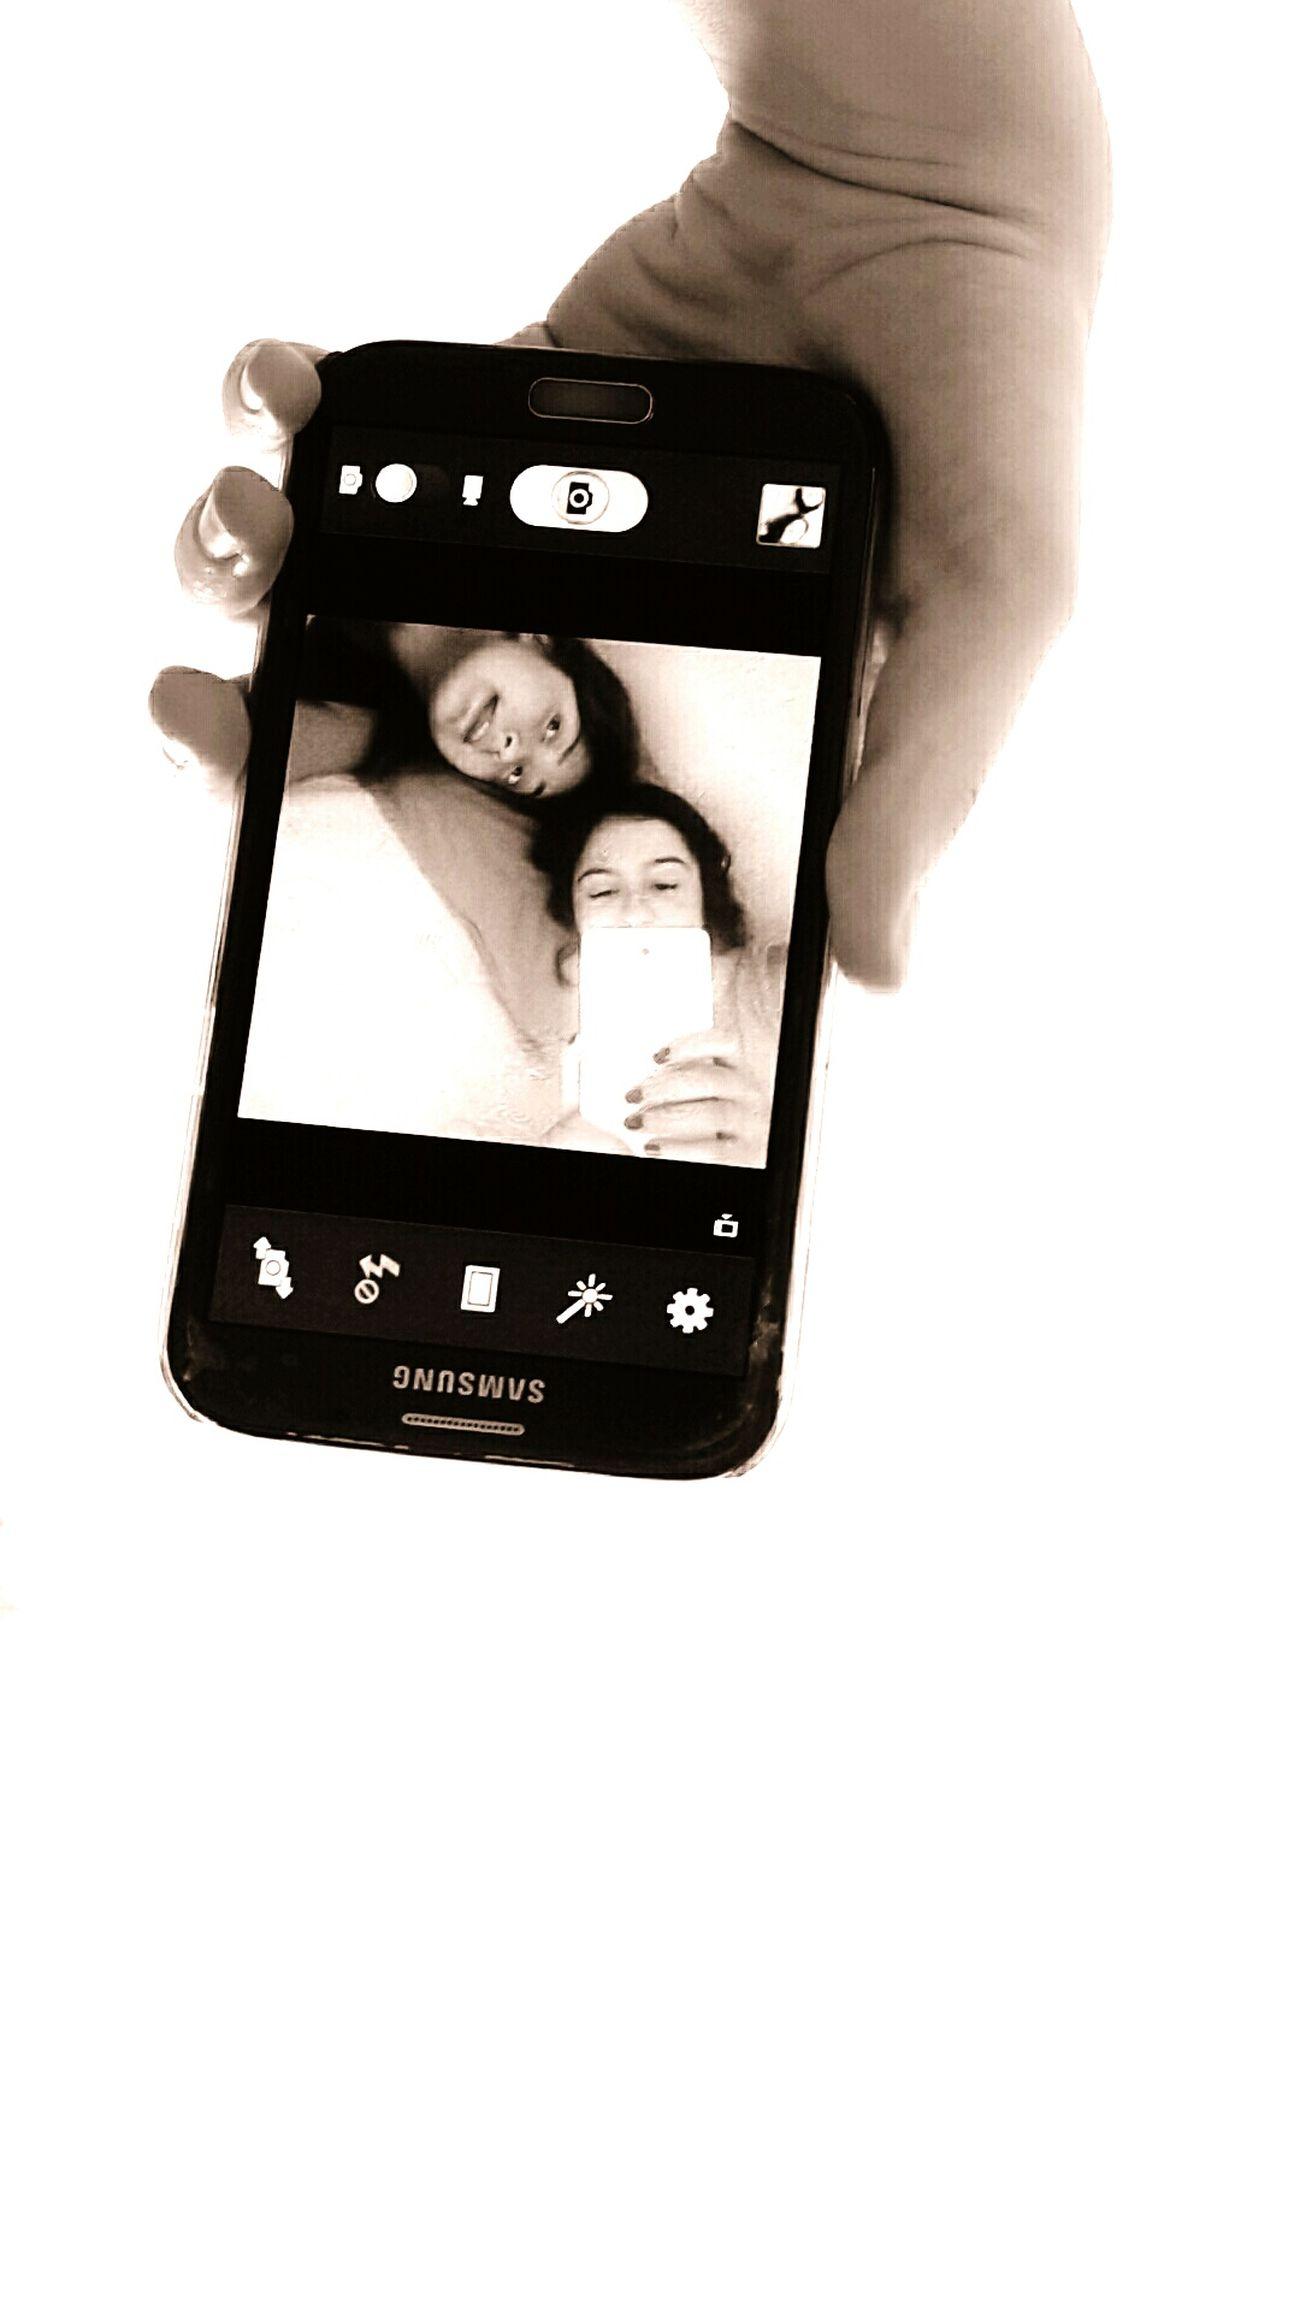 Photography Funnypictures Samsung Galaxy Note 3 Blackandwhite MSGSU Vscocam Creative ıstanbul Architecturestudents MSGSU